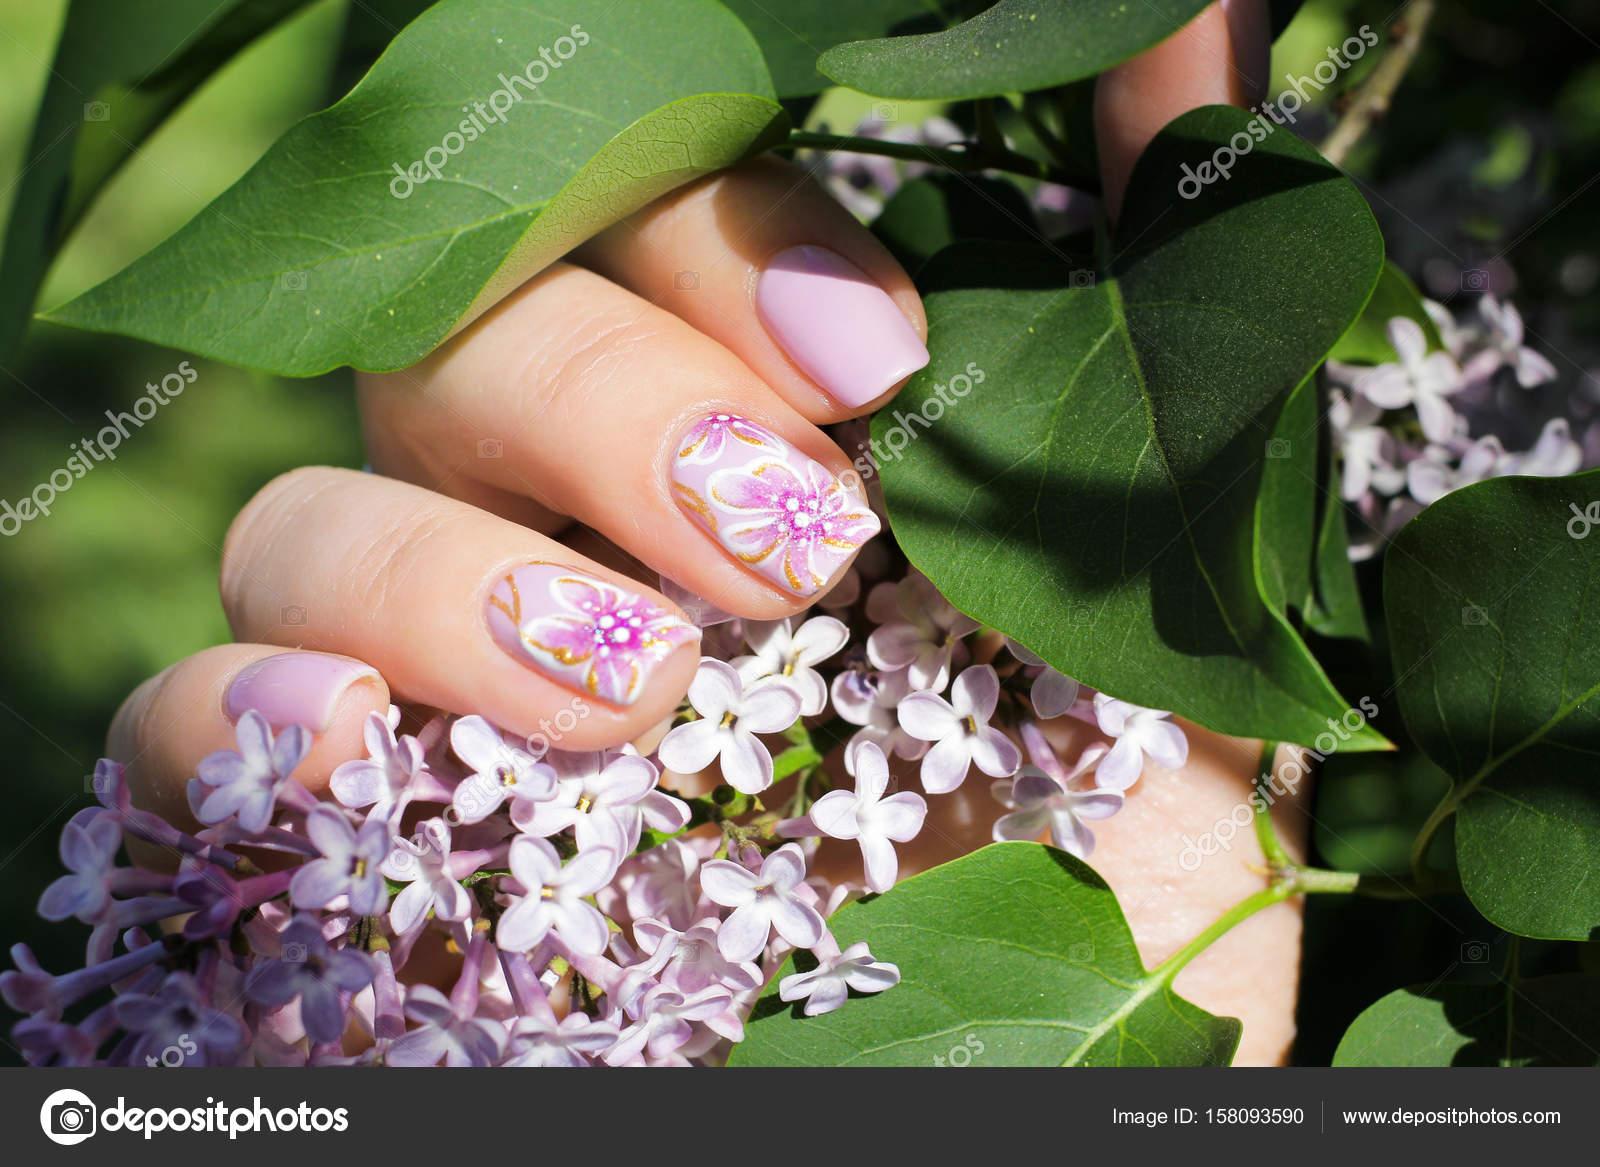 Uñas con diseño natural - shilak — Foto de stock © Bagira262626 ...